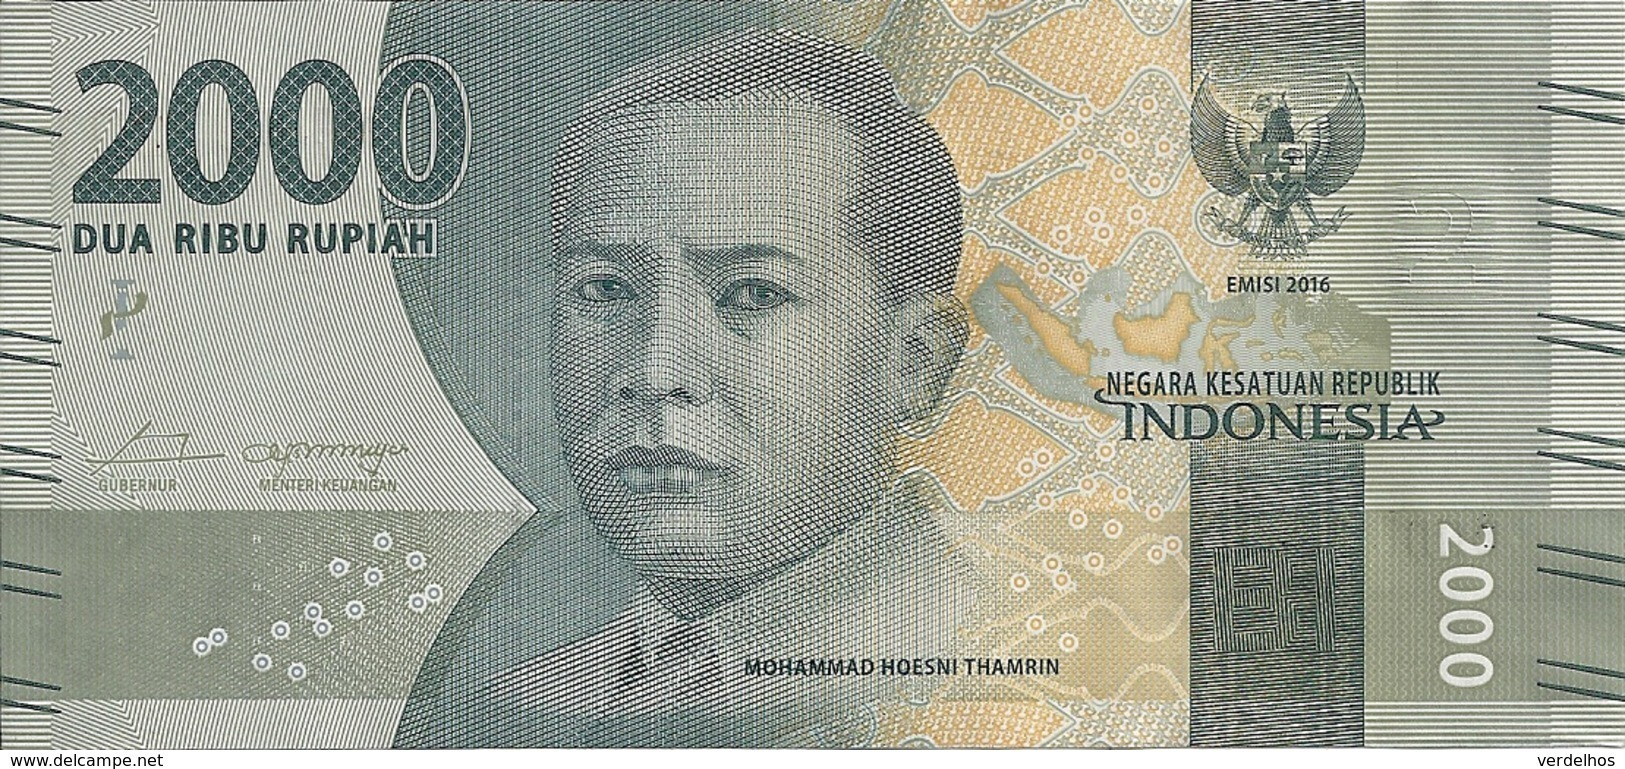 INDONESIE 2000 RUPIAH 2016 UNC P 155 A - Indonésie